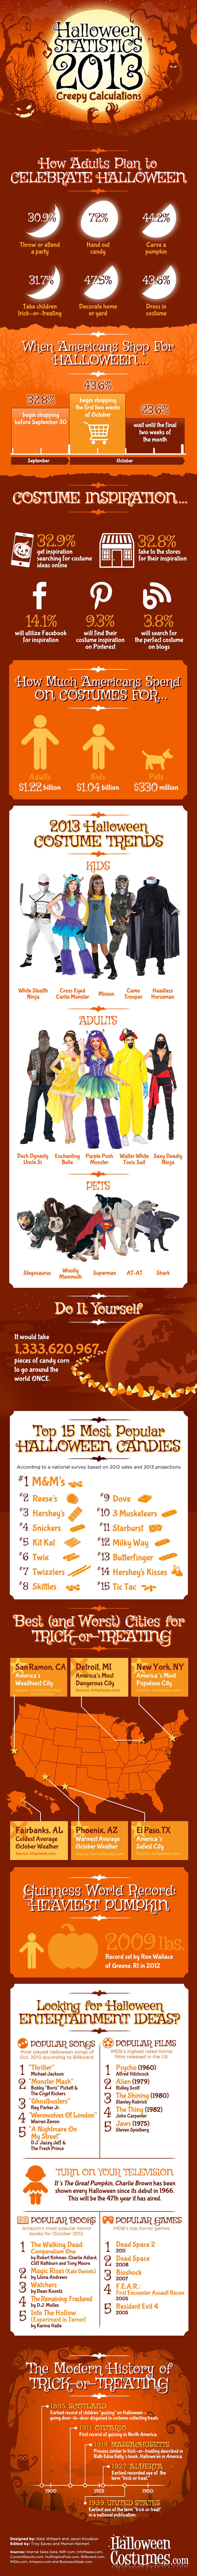 Creepy Calculations: 2013 Halloween Statistics